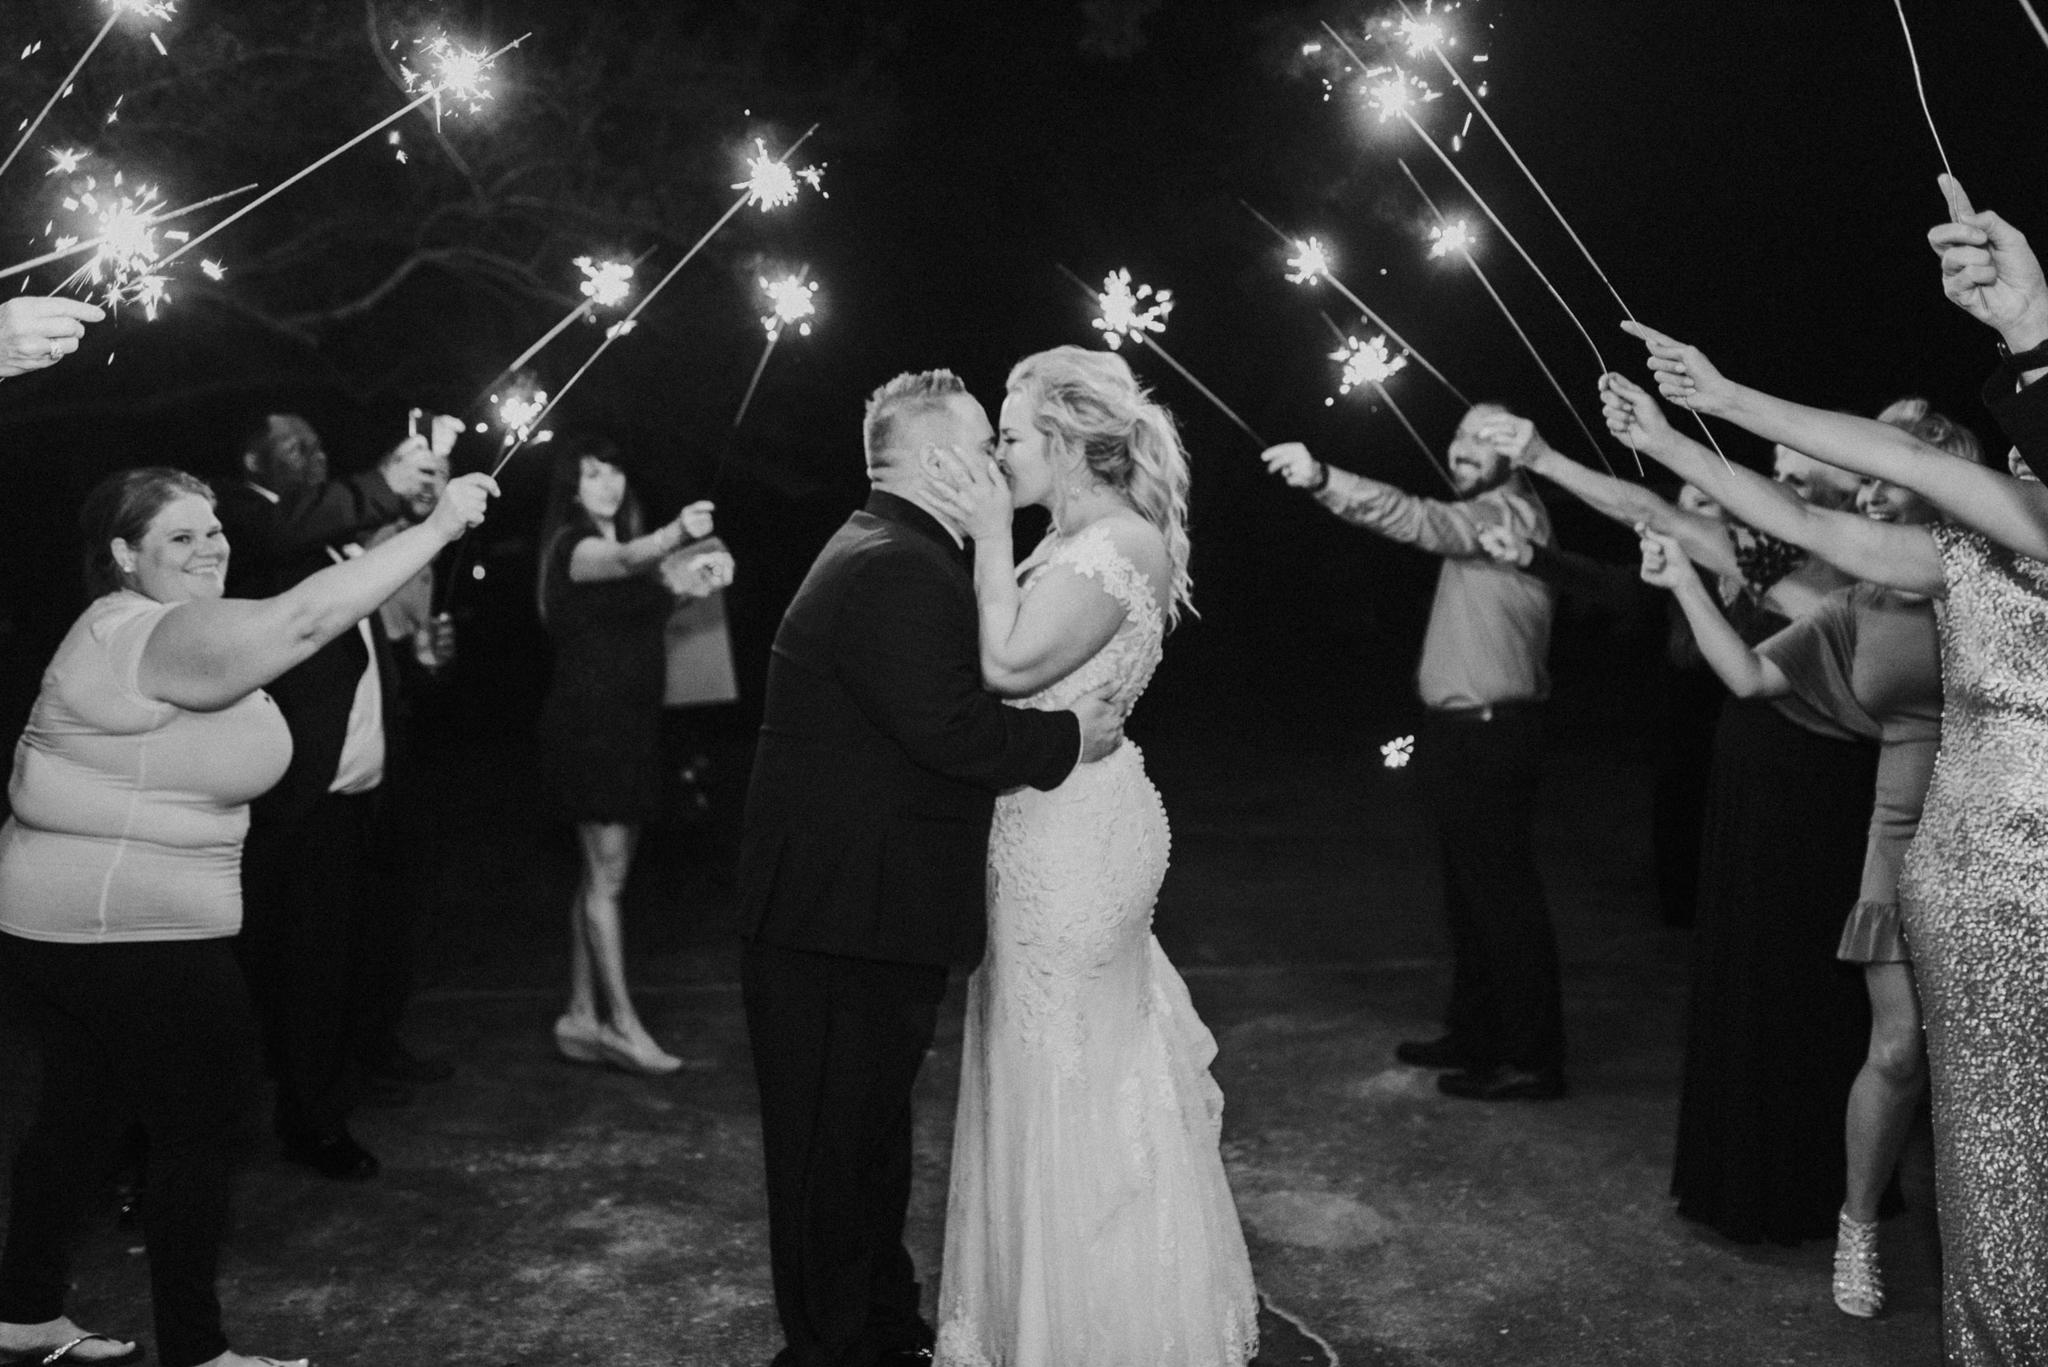 Houston Wedding Photographer-Intimate Texas Backyard Wedding- Houston Wedding Photographer -Kristen Giles Photography-59.jpg